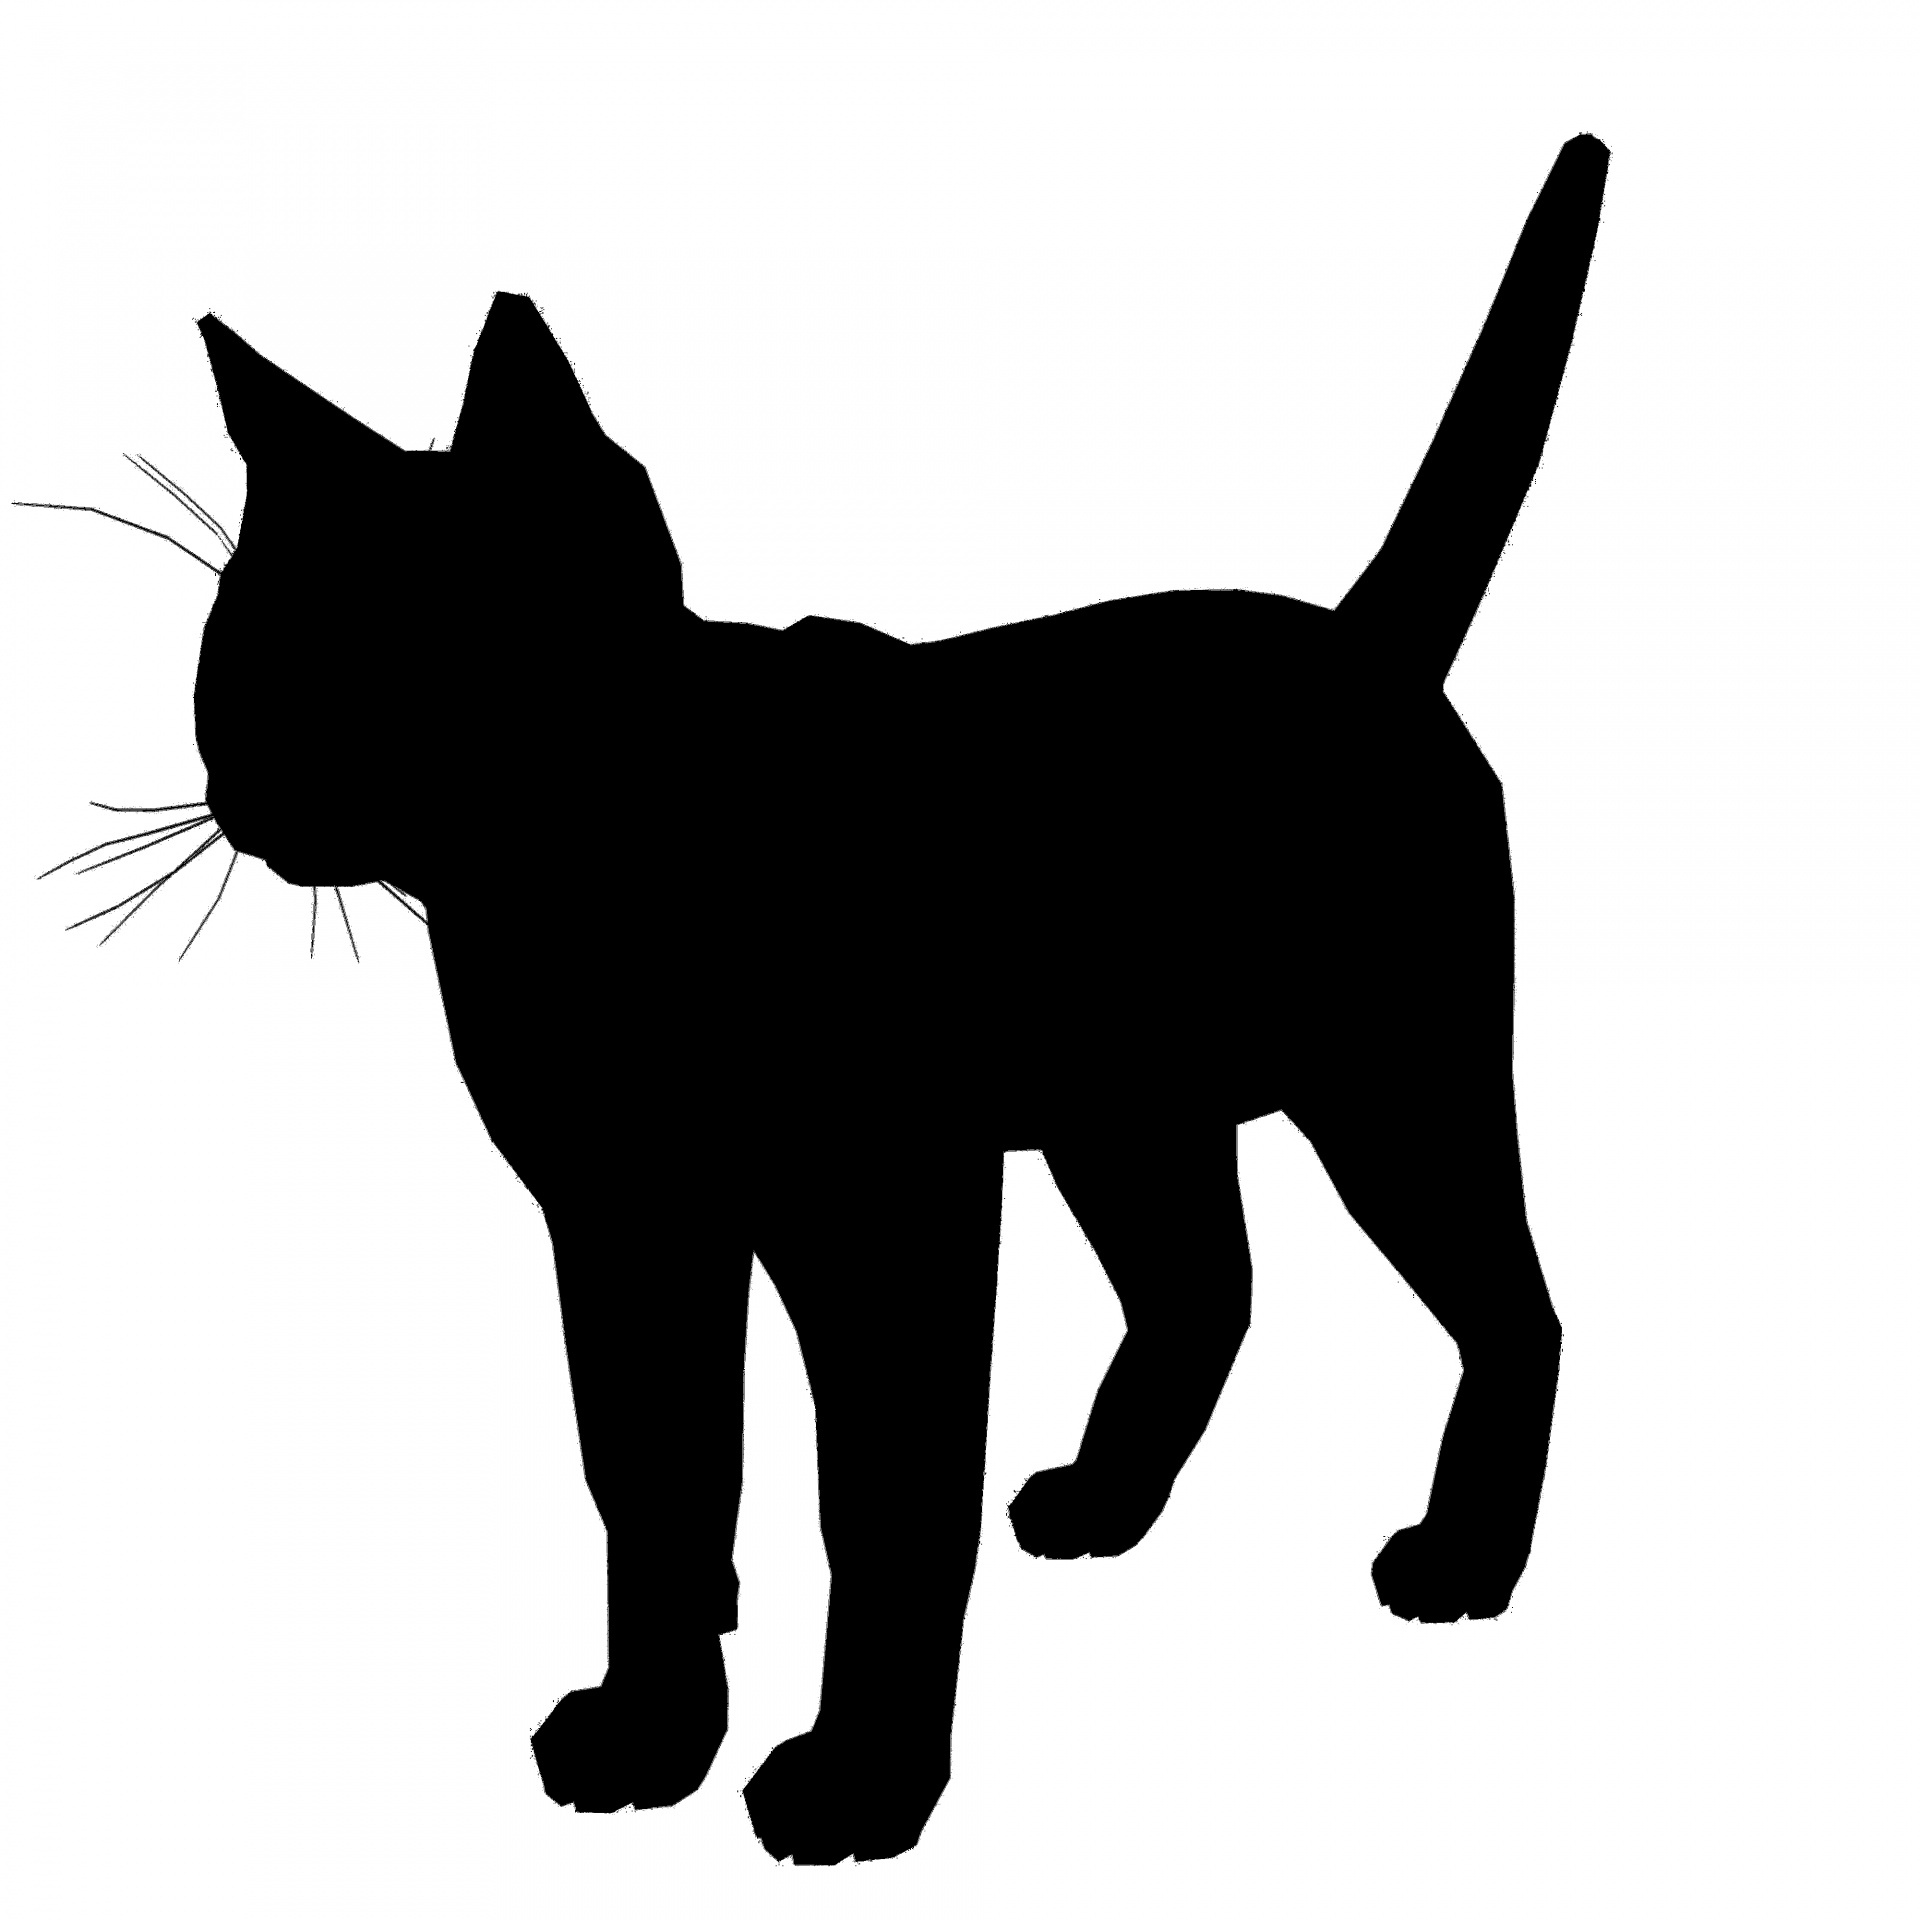 1920x1920 Cat Silhouette Free Stock Photo